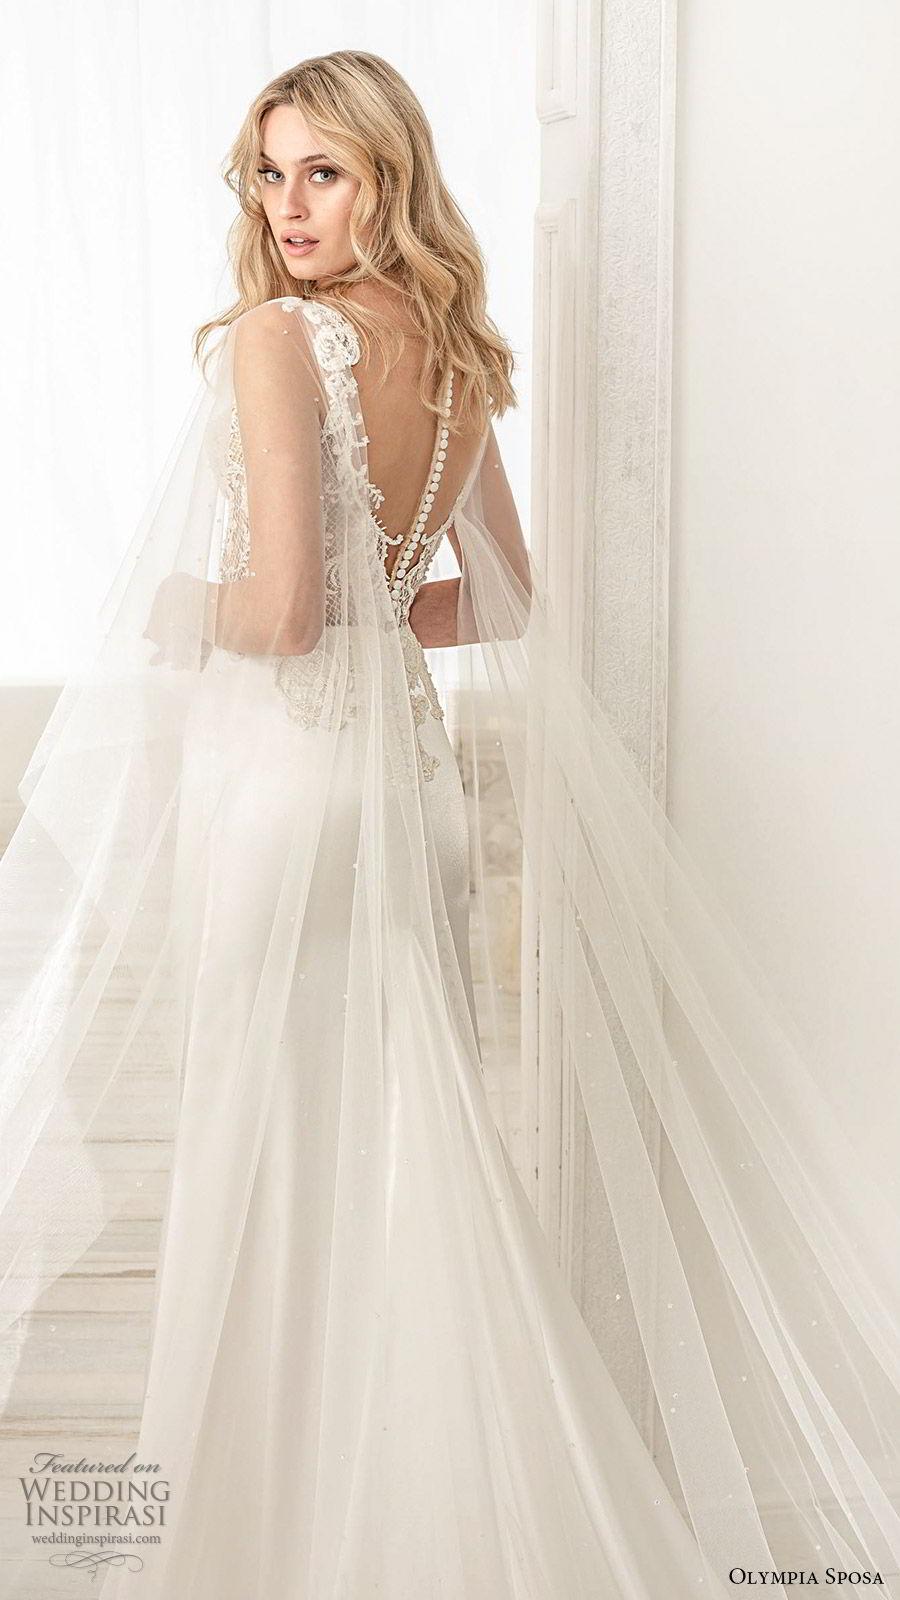 olympia sposa 2020 bridal illusion flutter sleeves sweetheart neckline embellished bodice sheath wedding dress (7) elegant romantic illusion back chapel train zbv